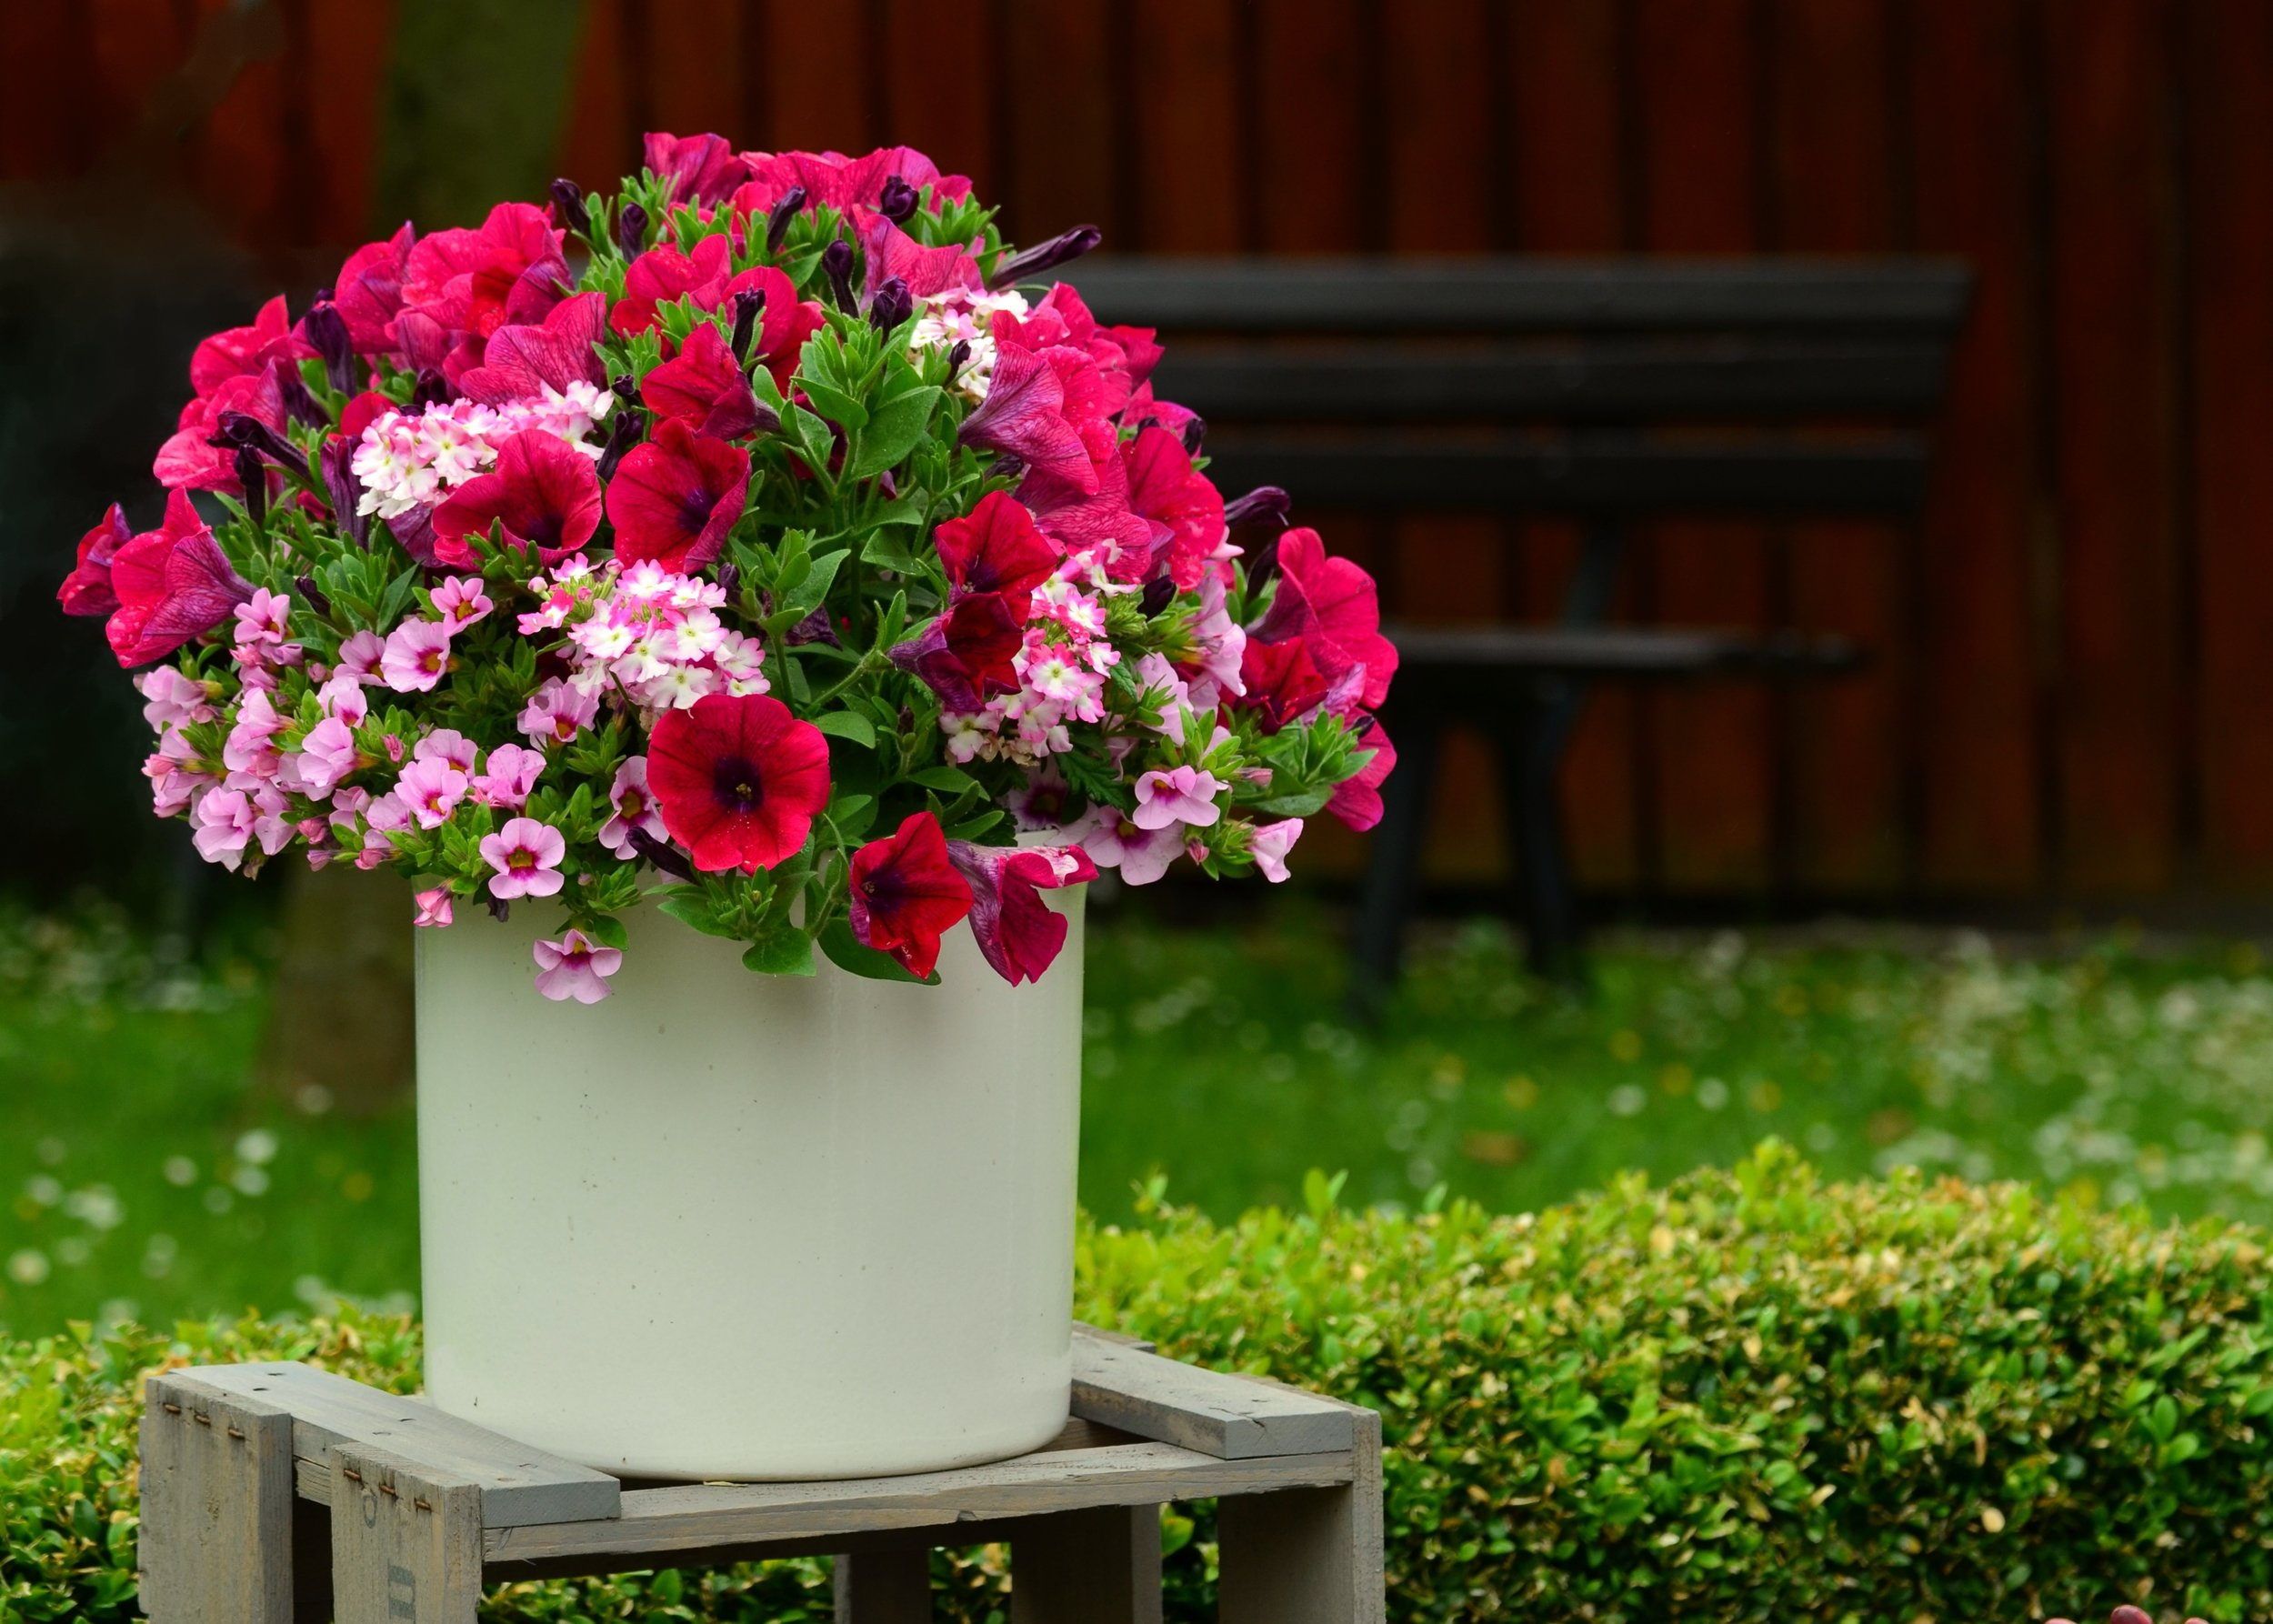 plant-lawn-flower-decoration-pink-flora-715088-pxhere.com.jpg